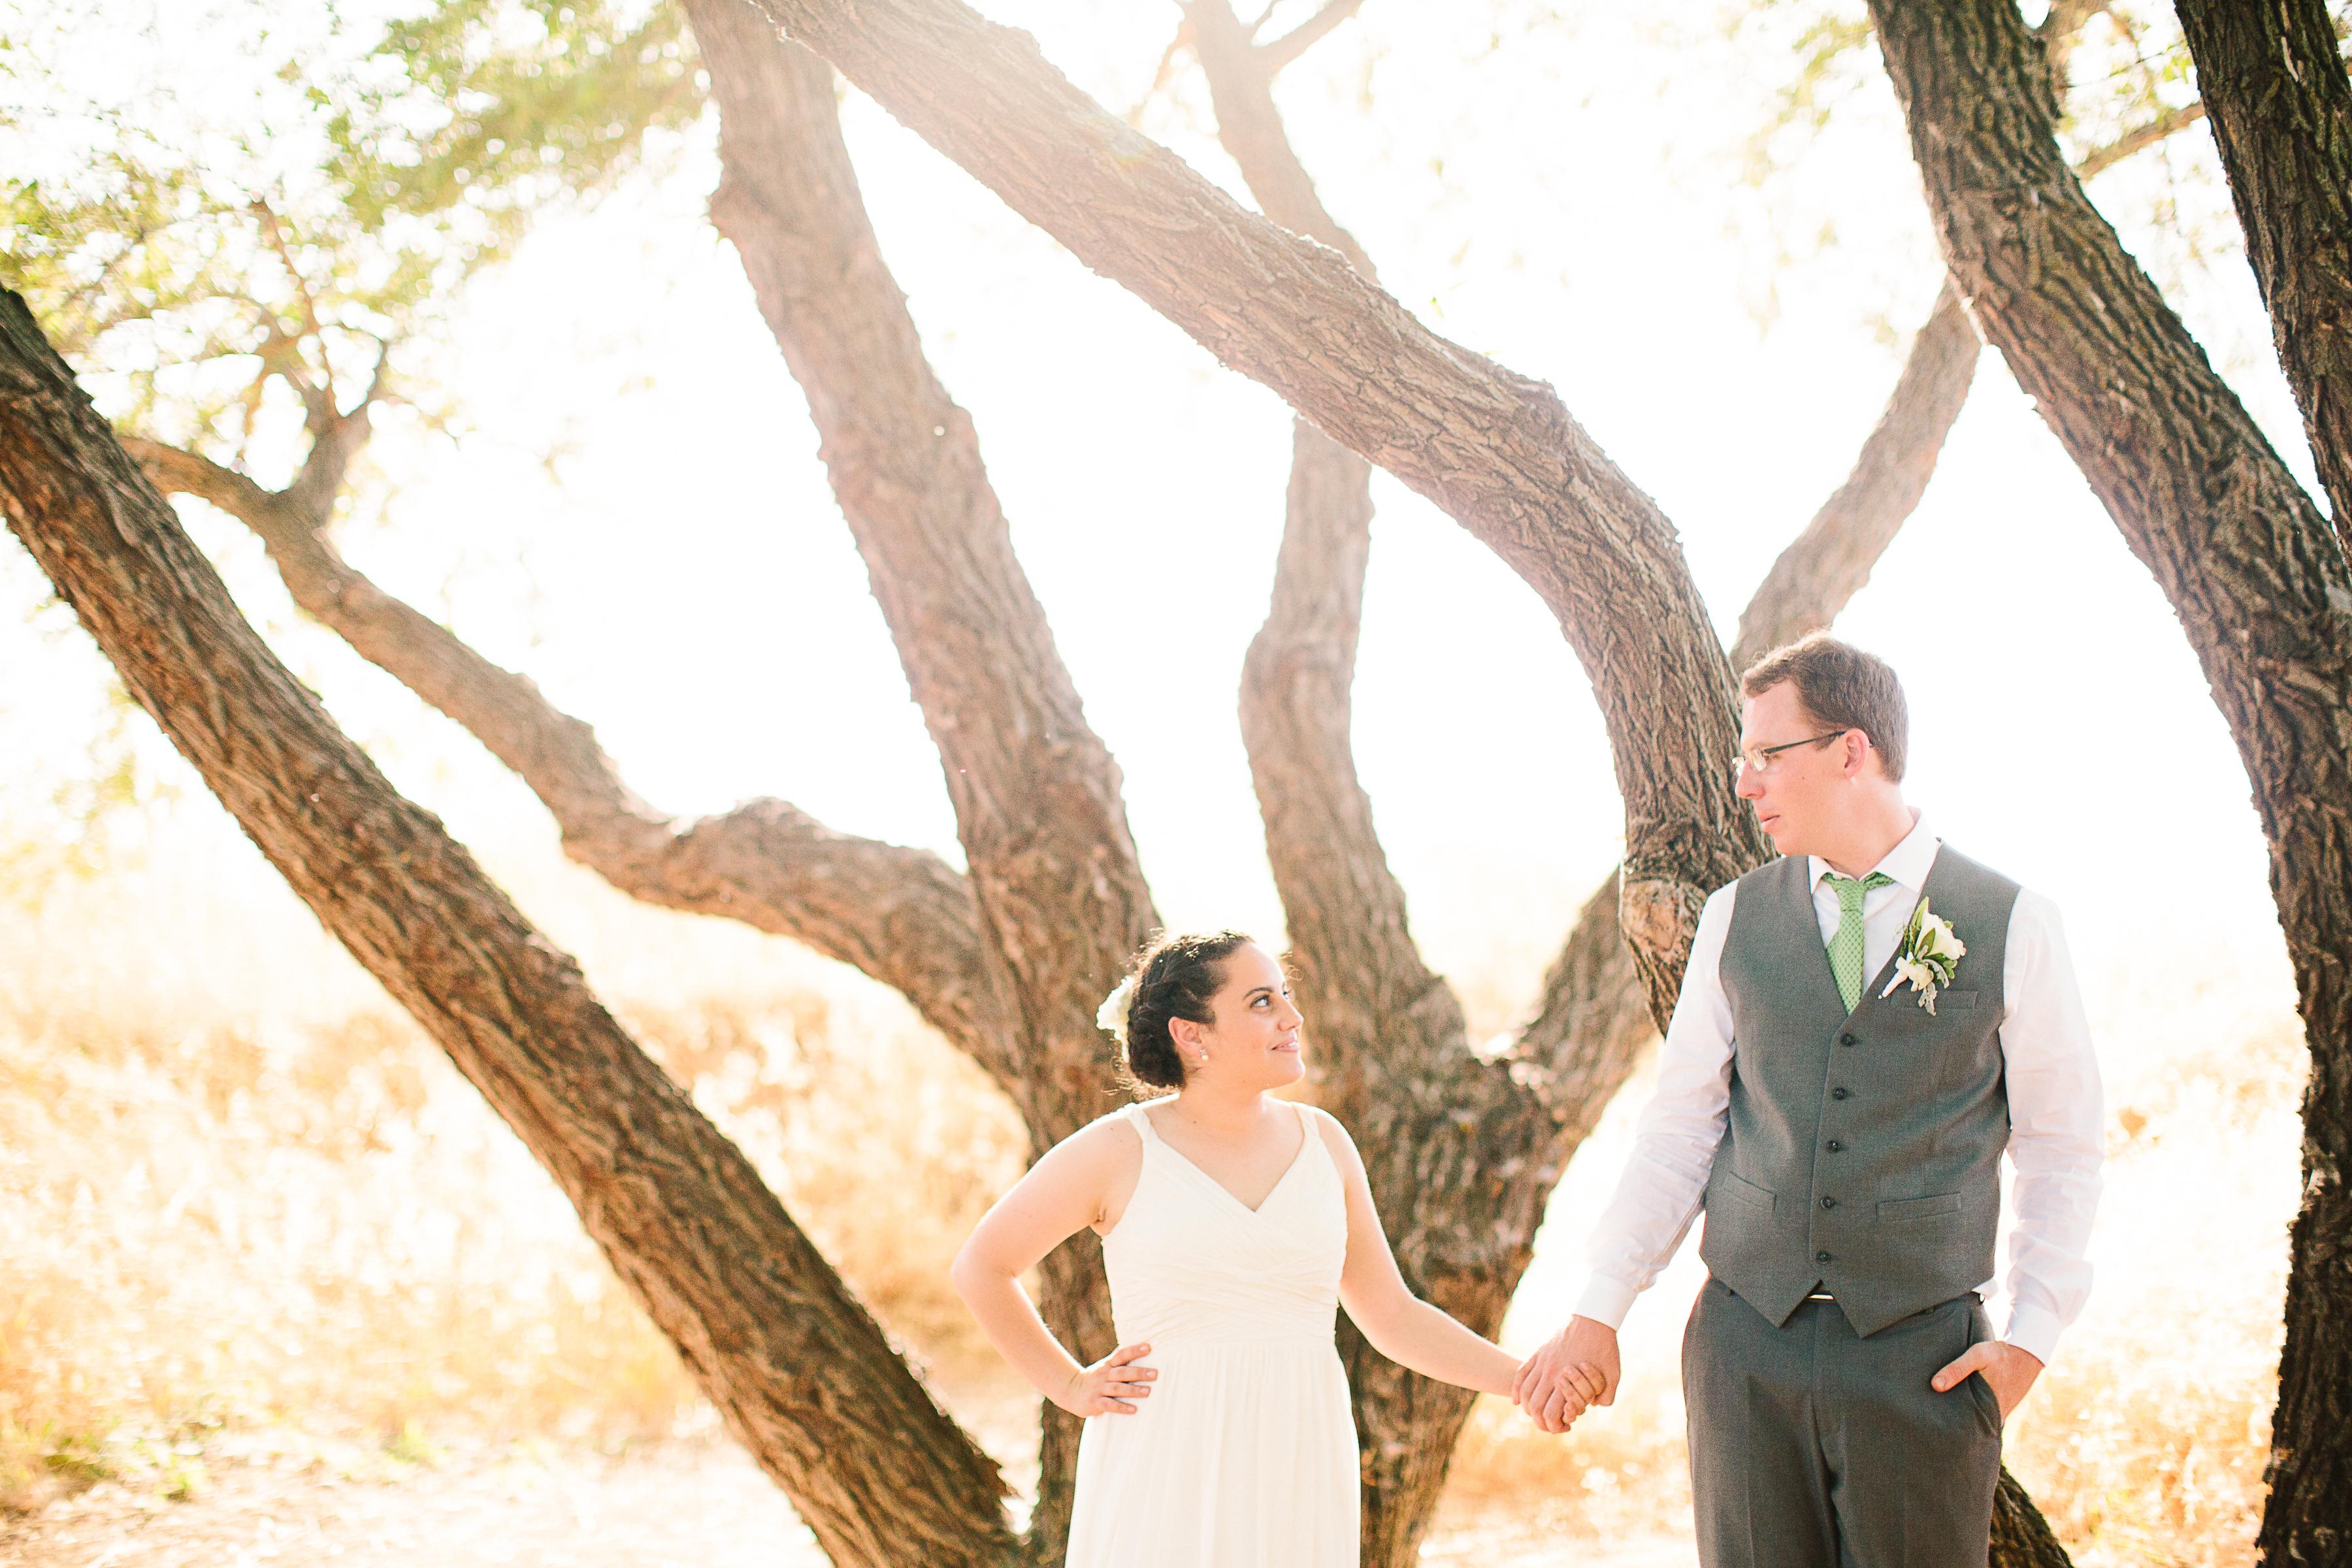 houckwedding-560 Garden Wedding at the Inn at Park Winters wedding